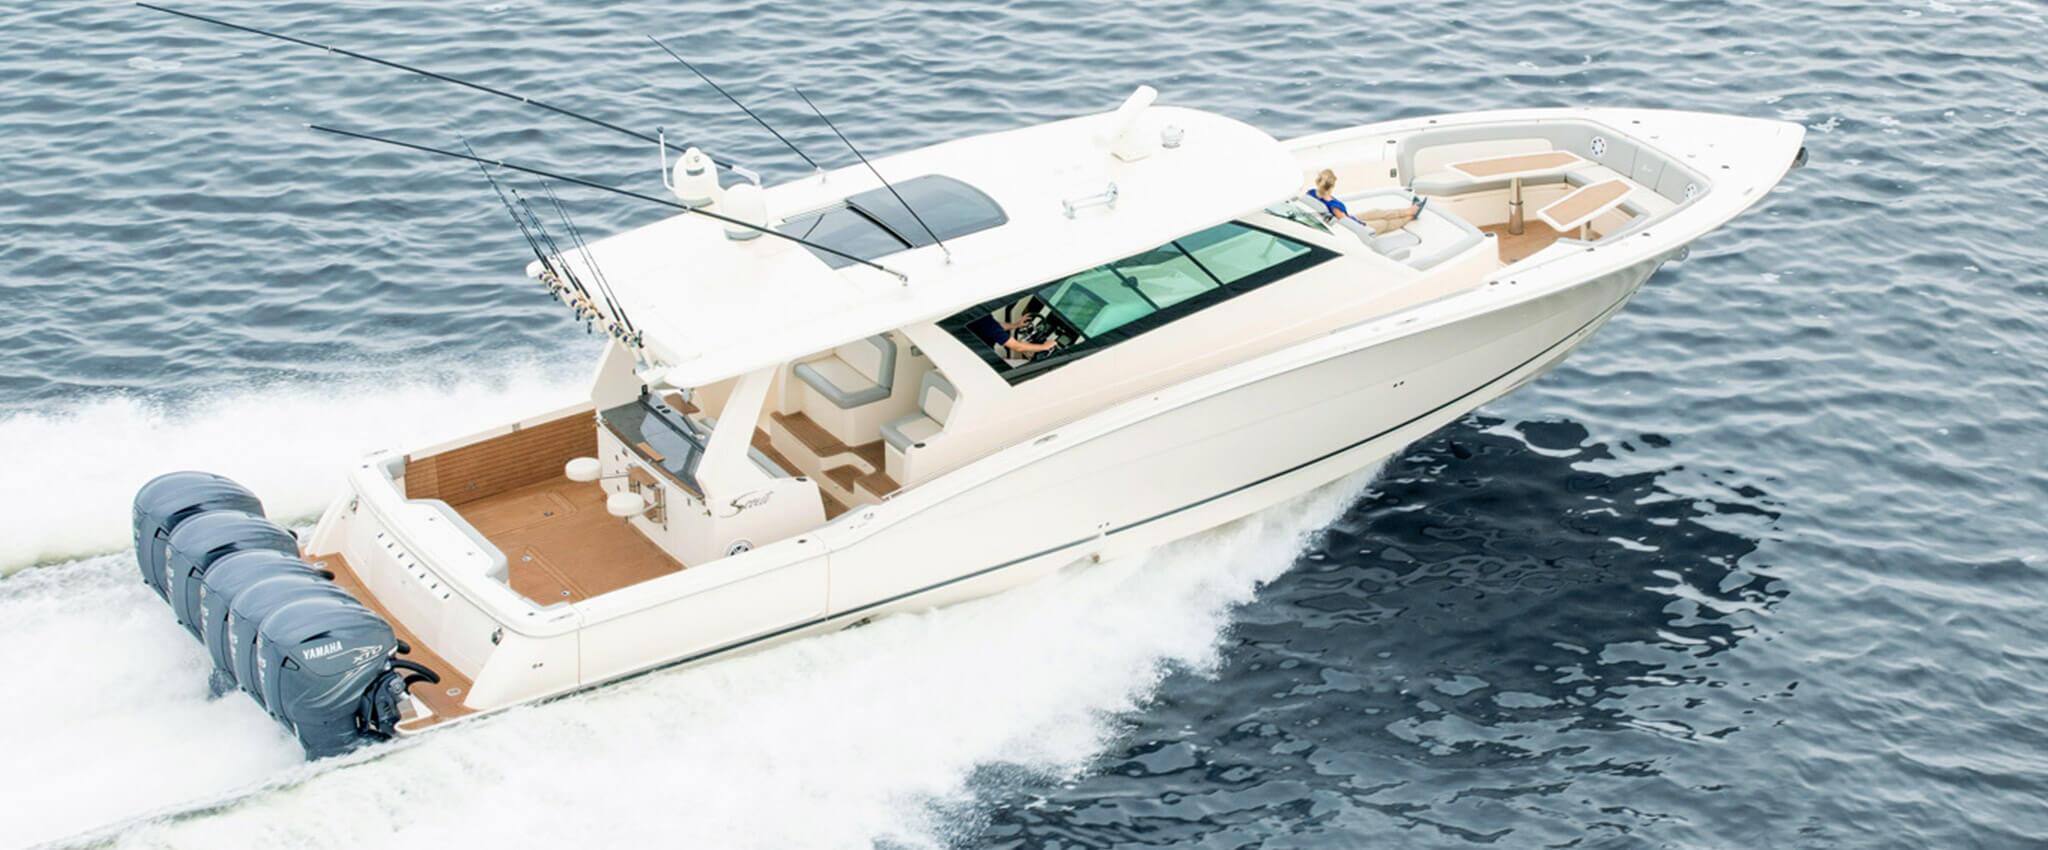 Scout 530 LXF 2020 Scout 530 LXF - Seven Seas Yacht Sales, Inc.